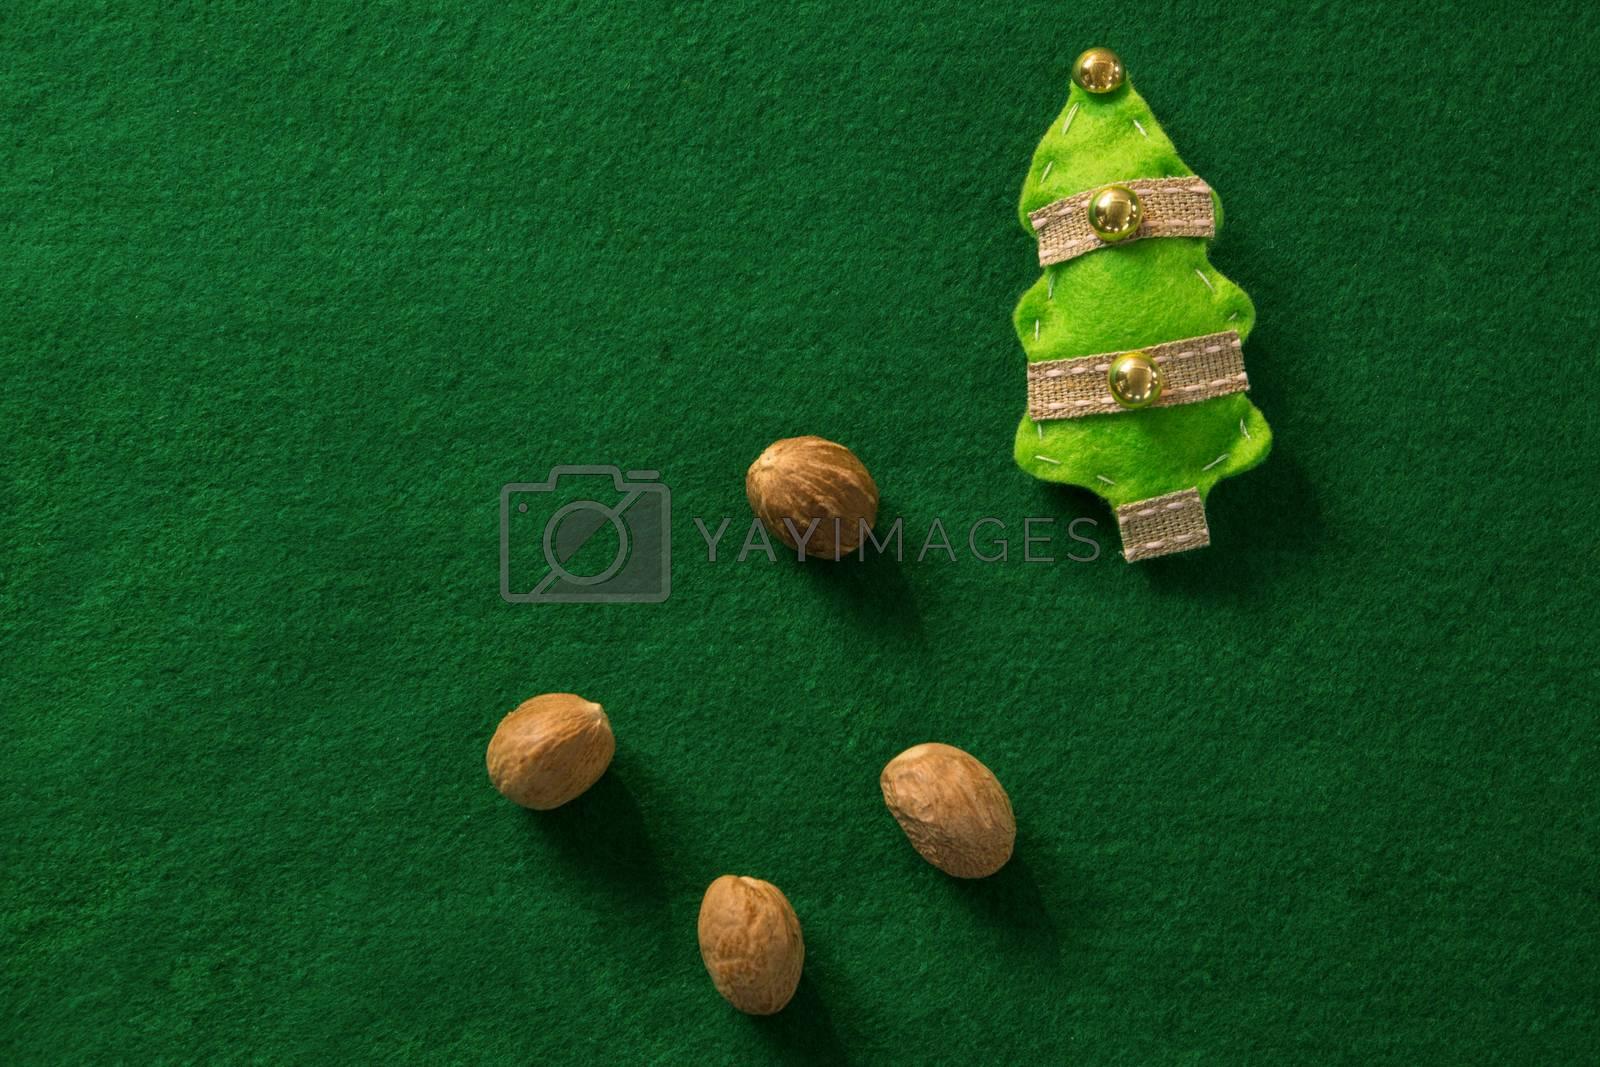 Overhead view of walnut with Christmas tree by Wavebreakmedia